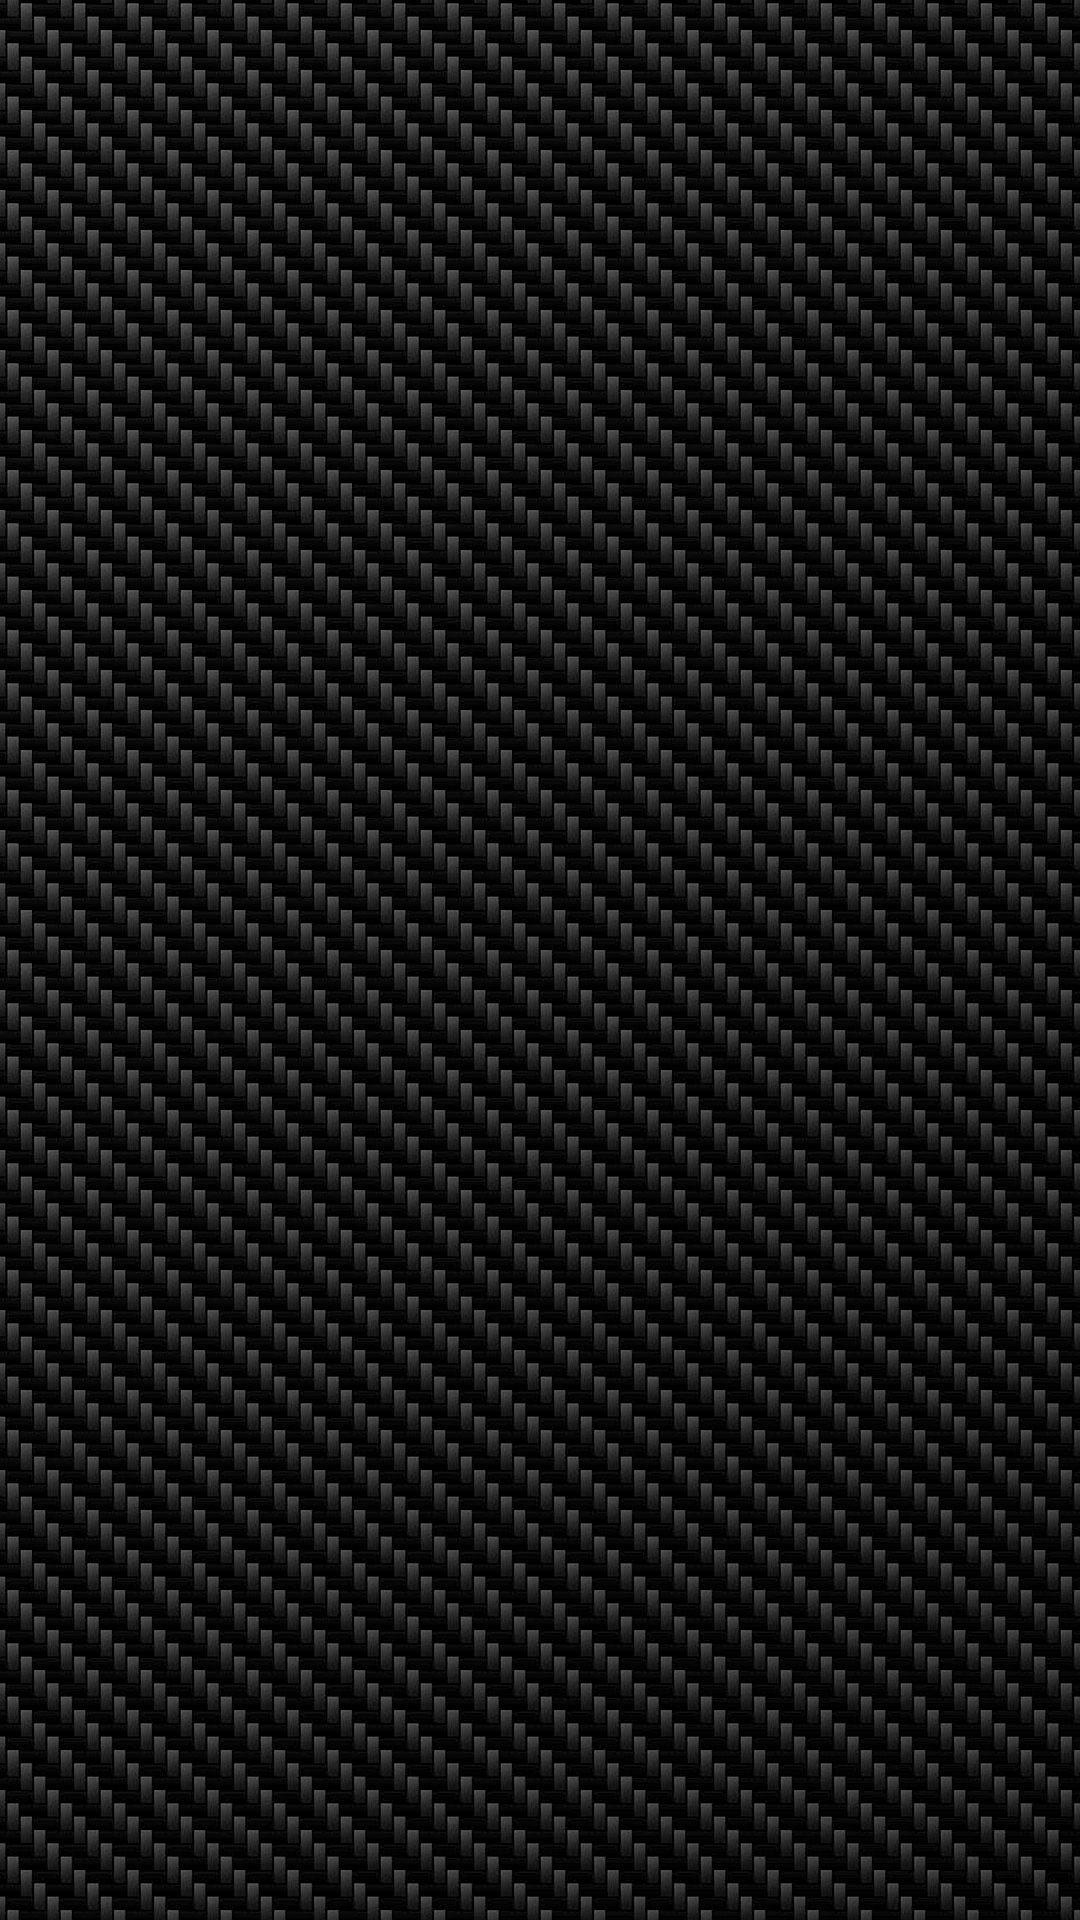 4k carbon fiber wallpaper 71 images - Carbon wallpaper iphone ...